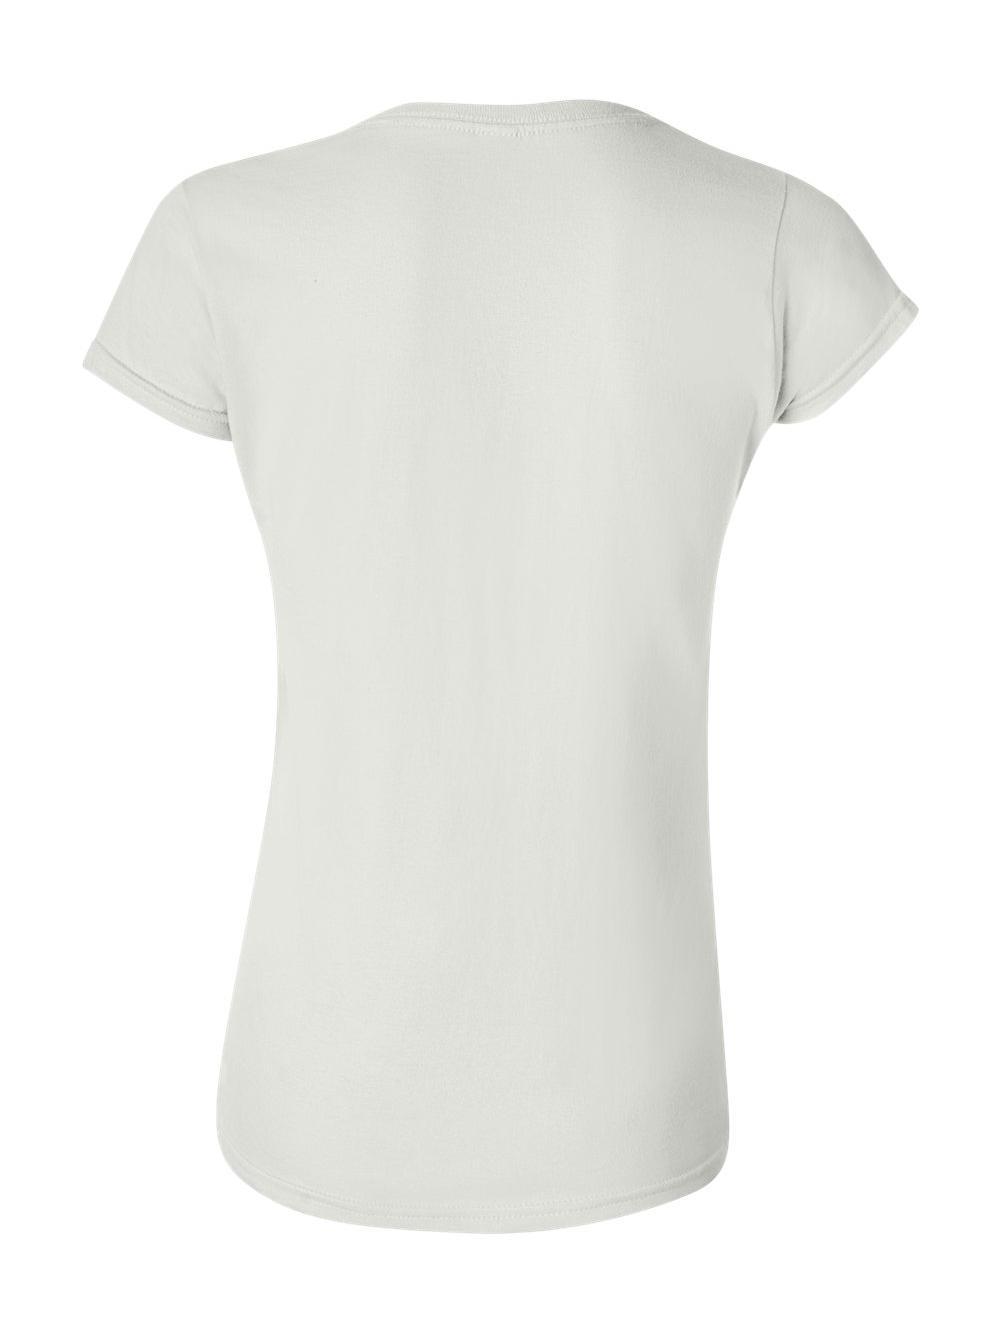 Gildan-Softstyle-Women-039-s-T-Shirt-64000L thumbnail 46